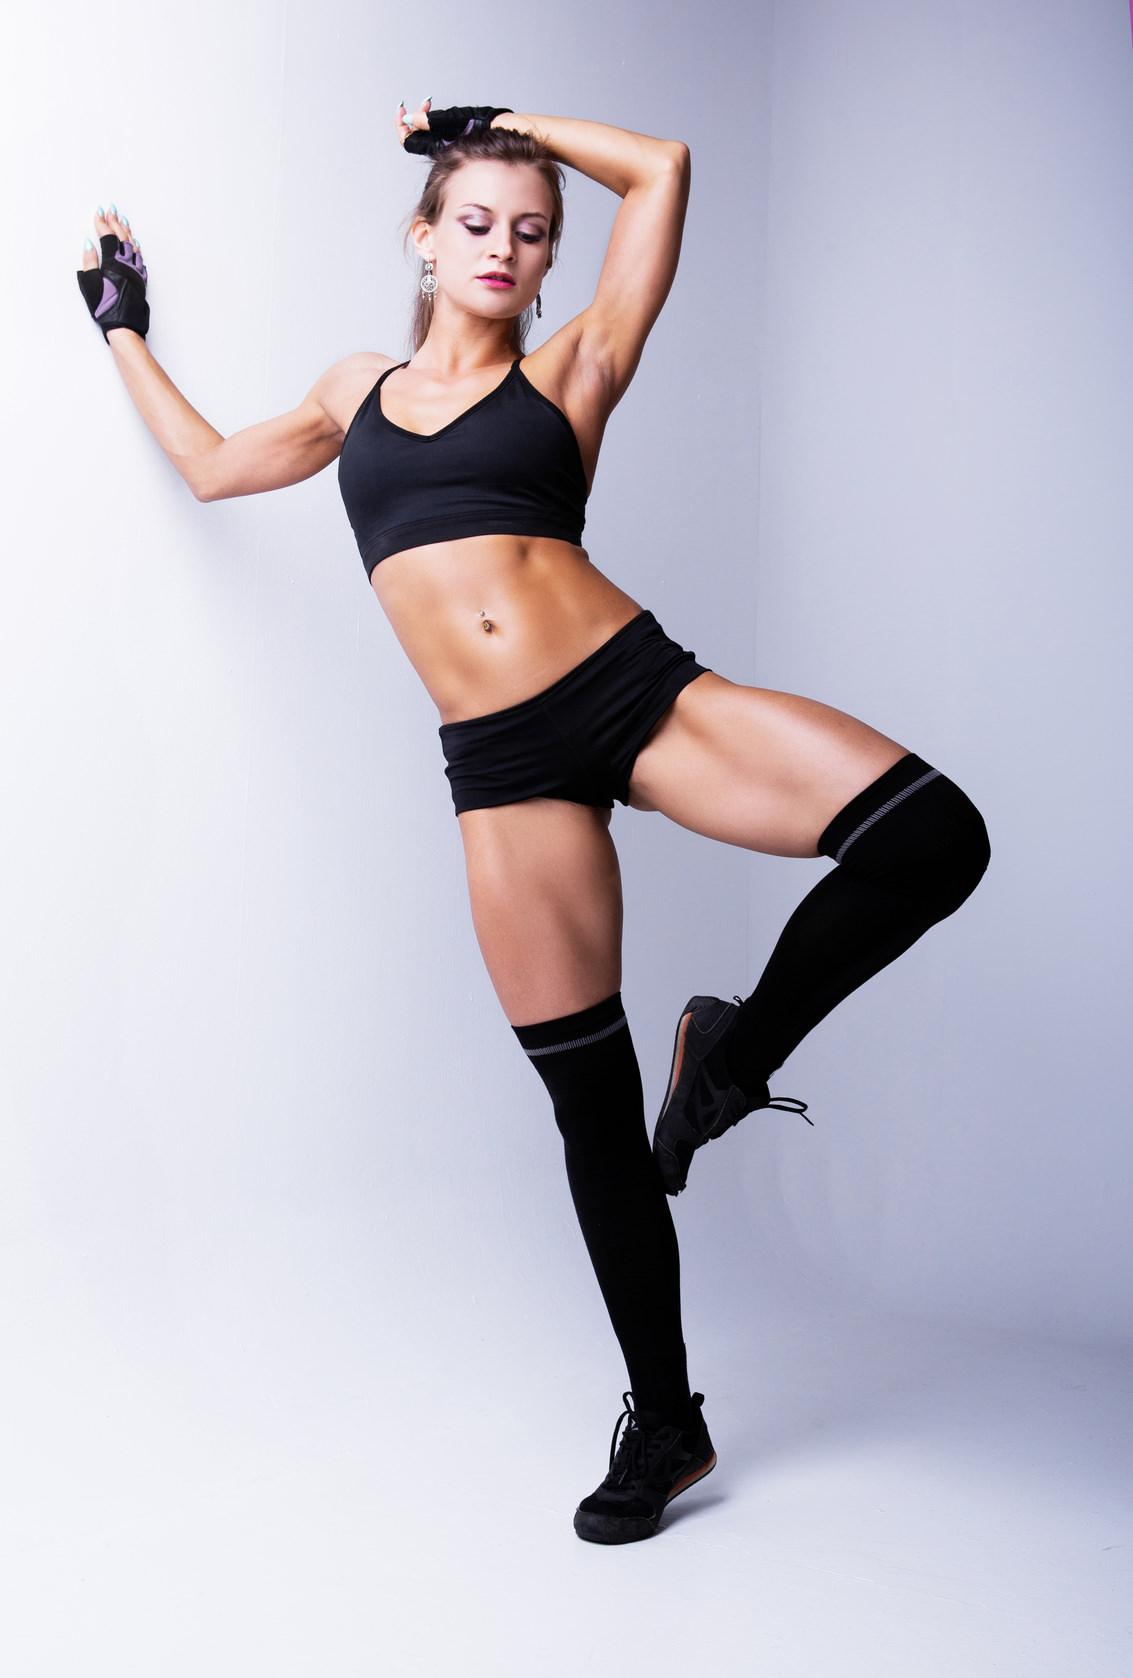 Fitnessmodel